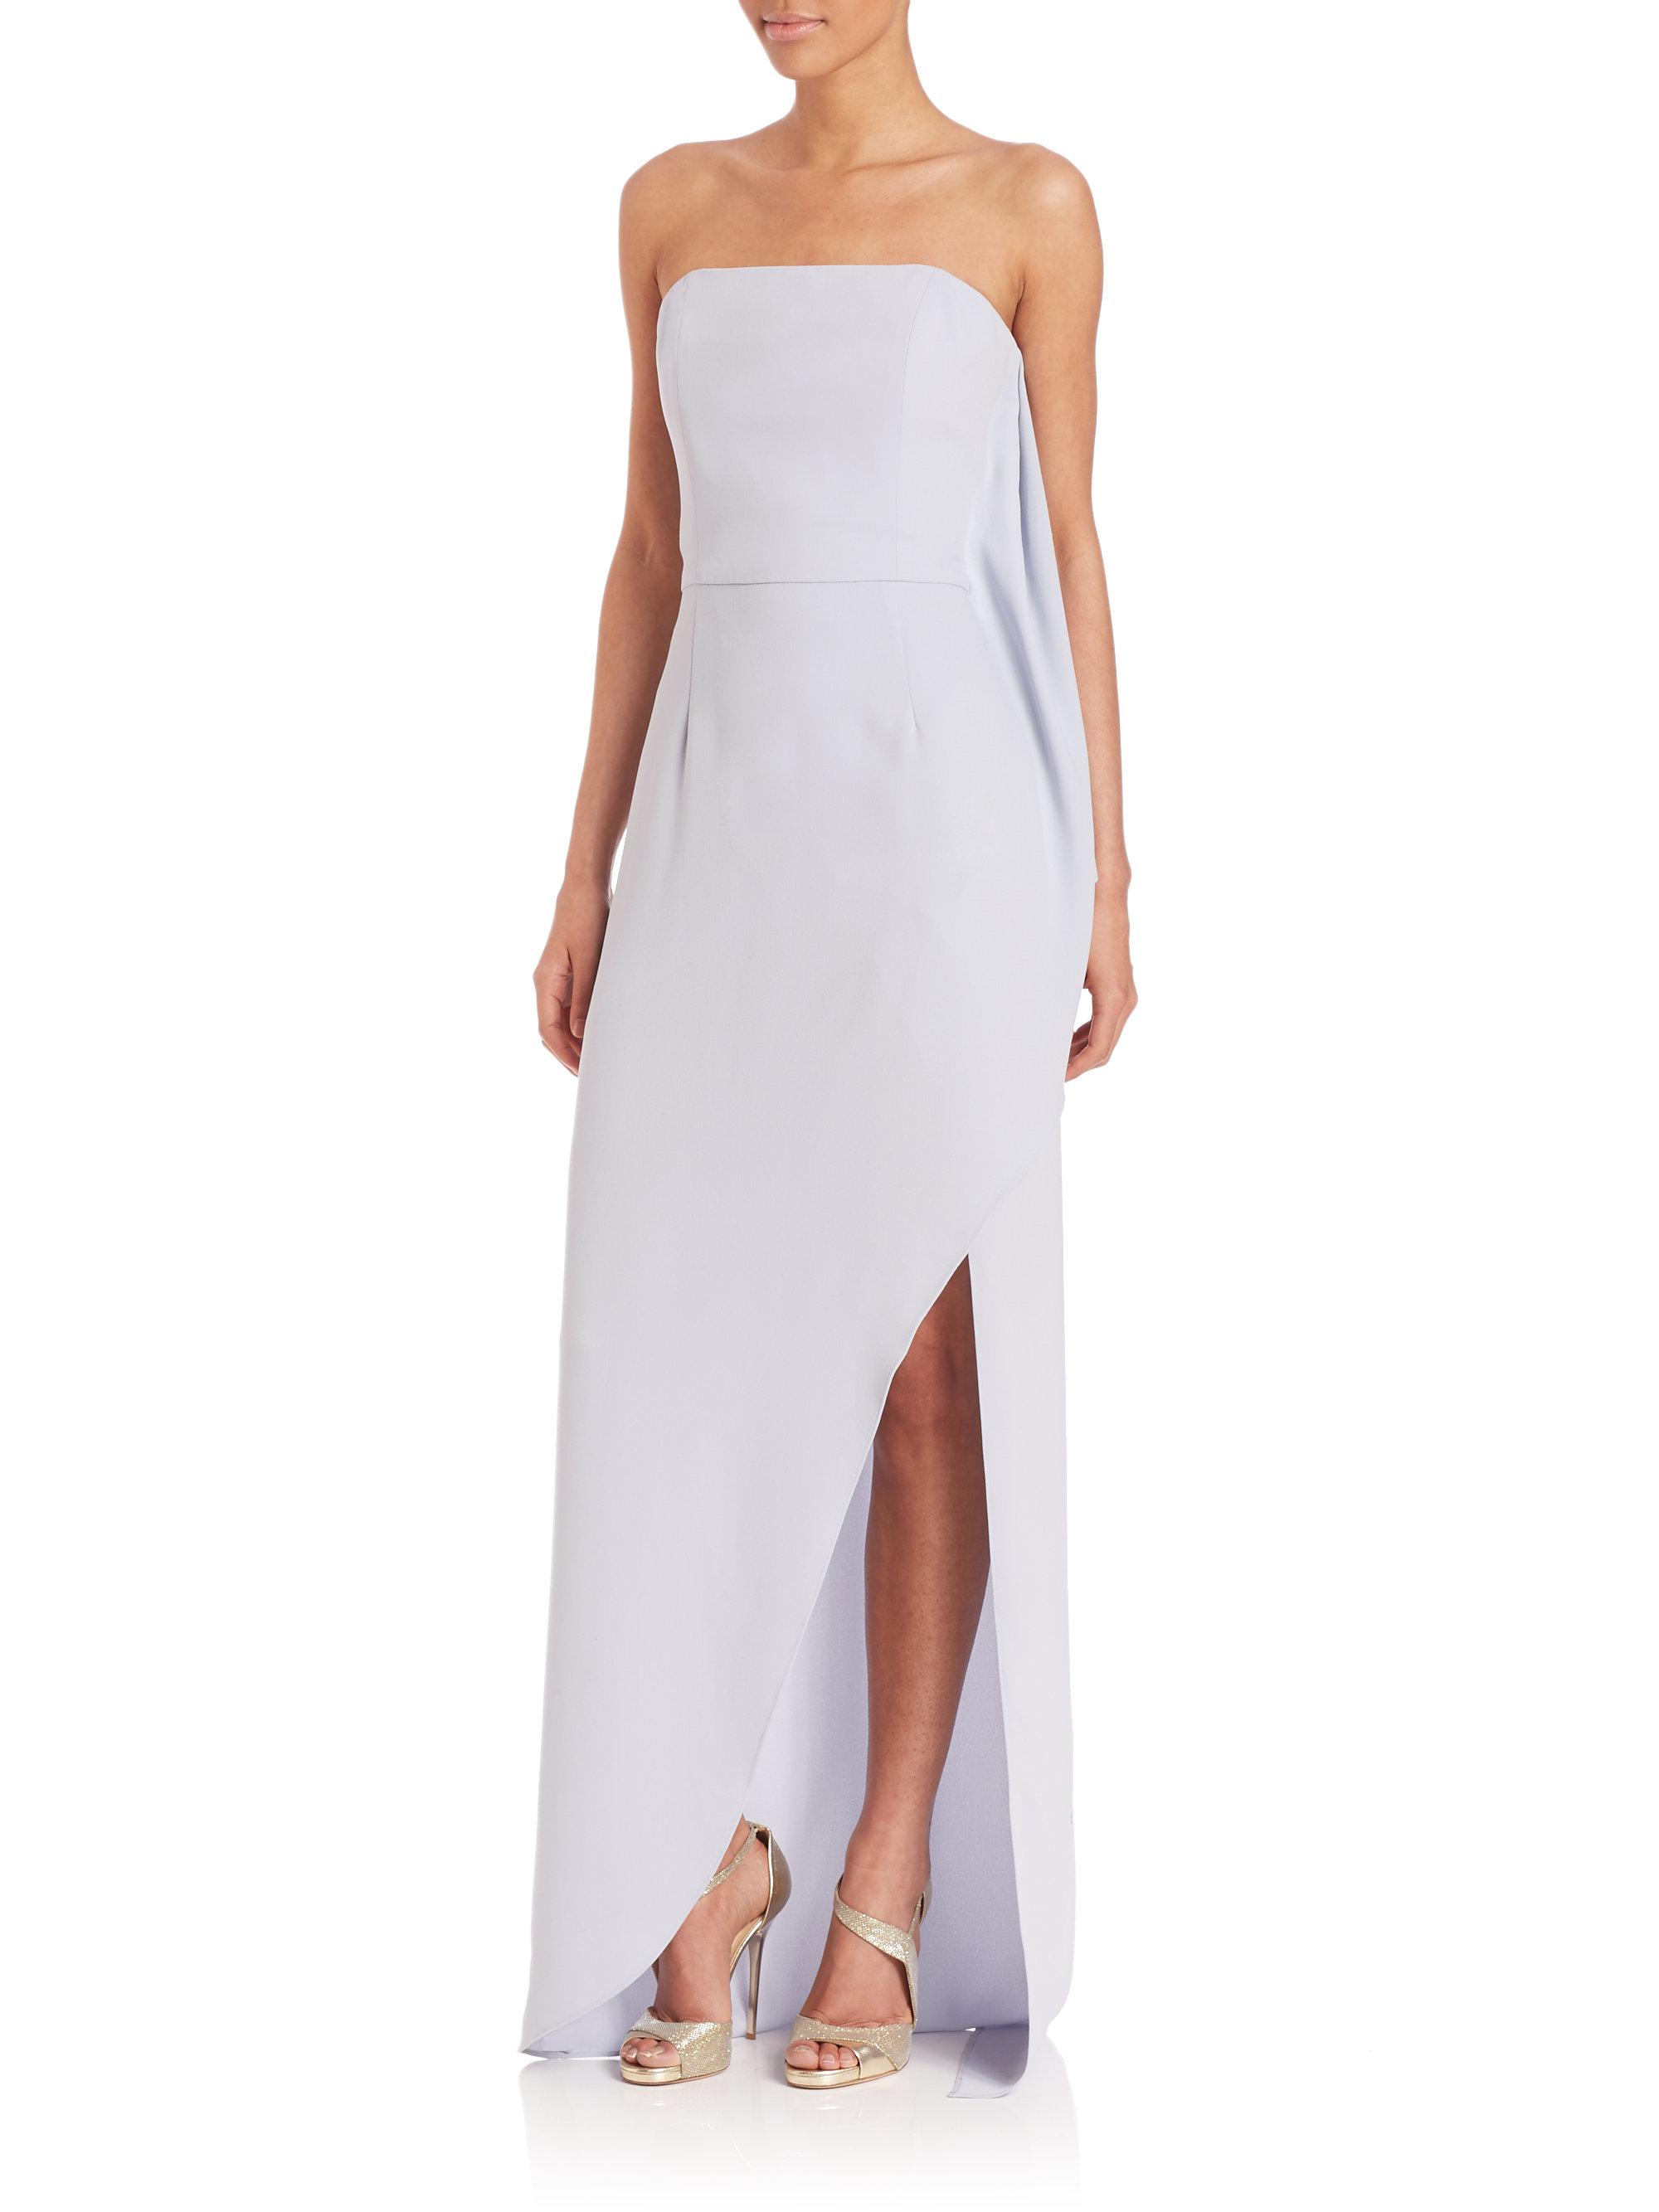 Lyst - Halston Strapless Crepe Gown in Metallic